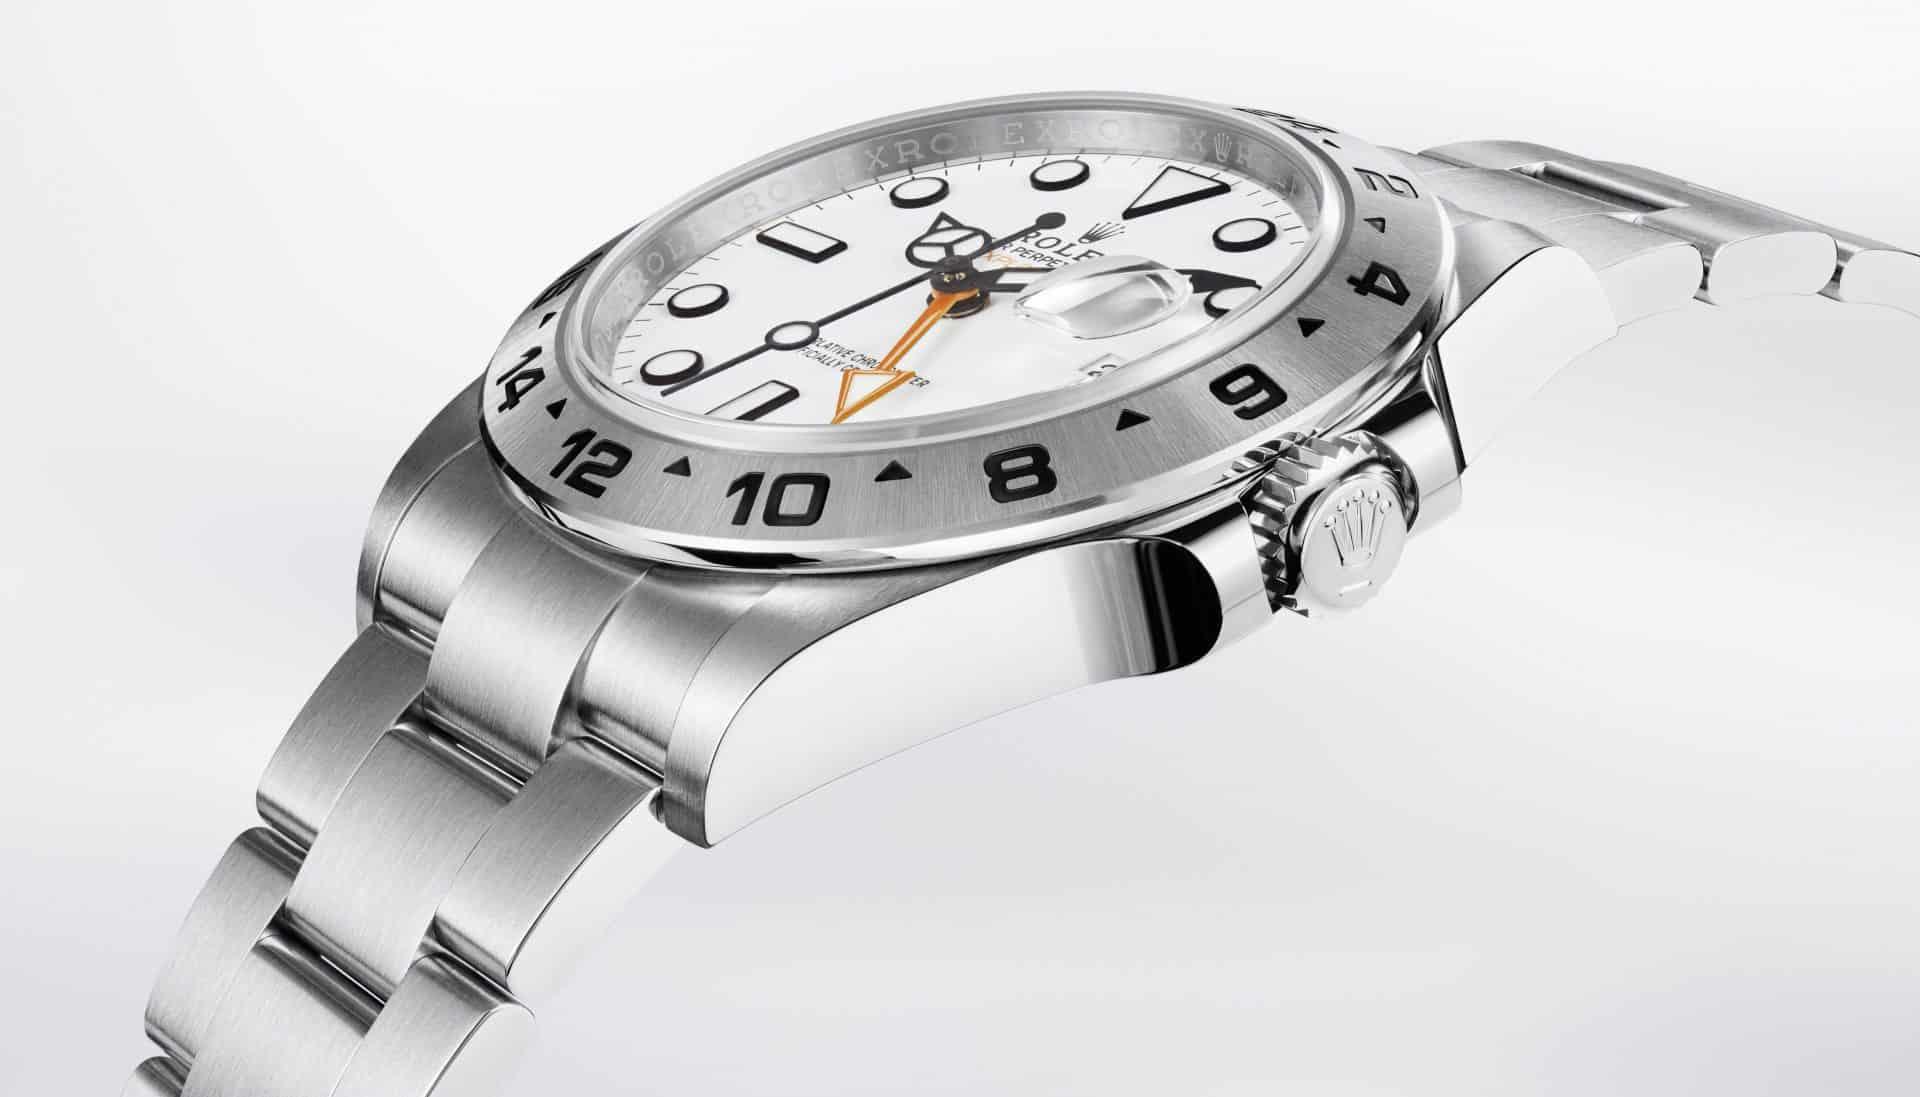 Rolex Explorer II Referenz 226570 Profil